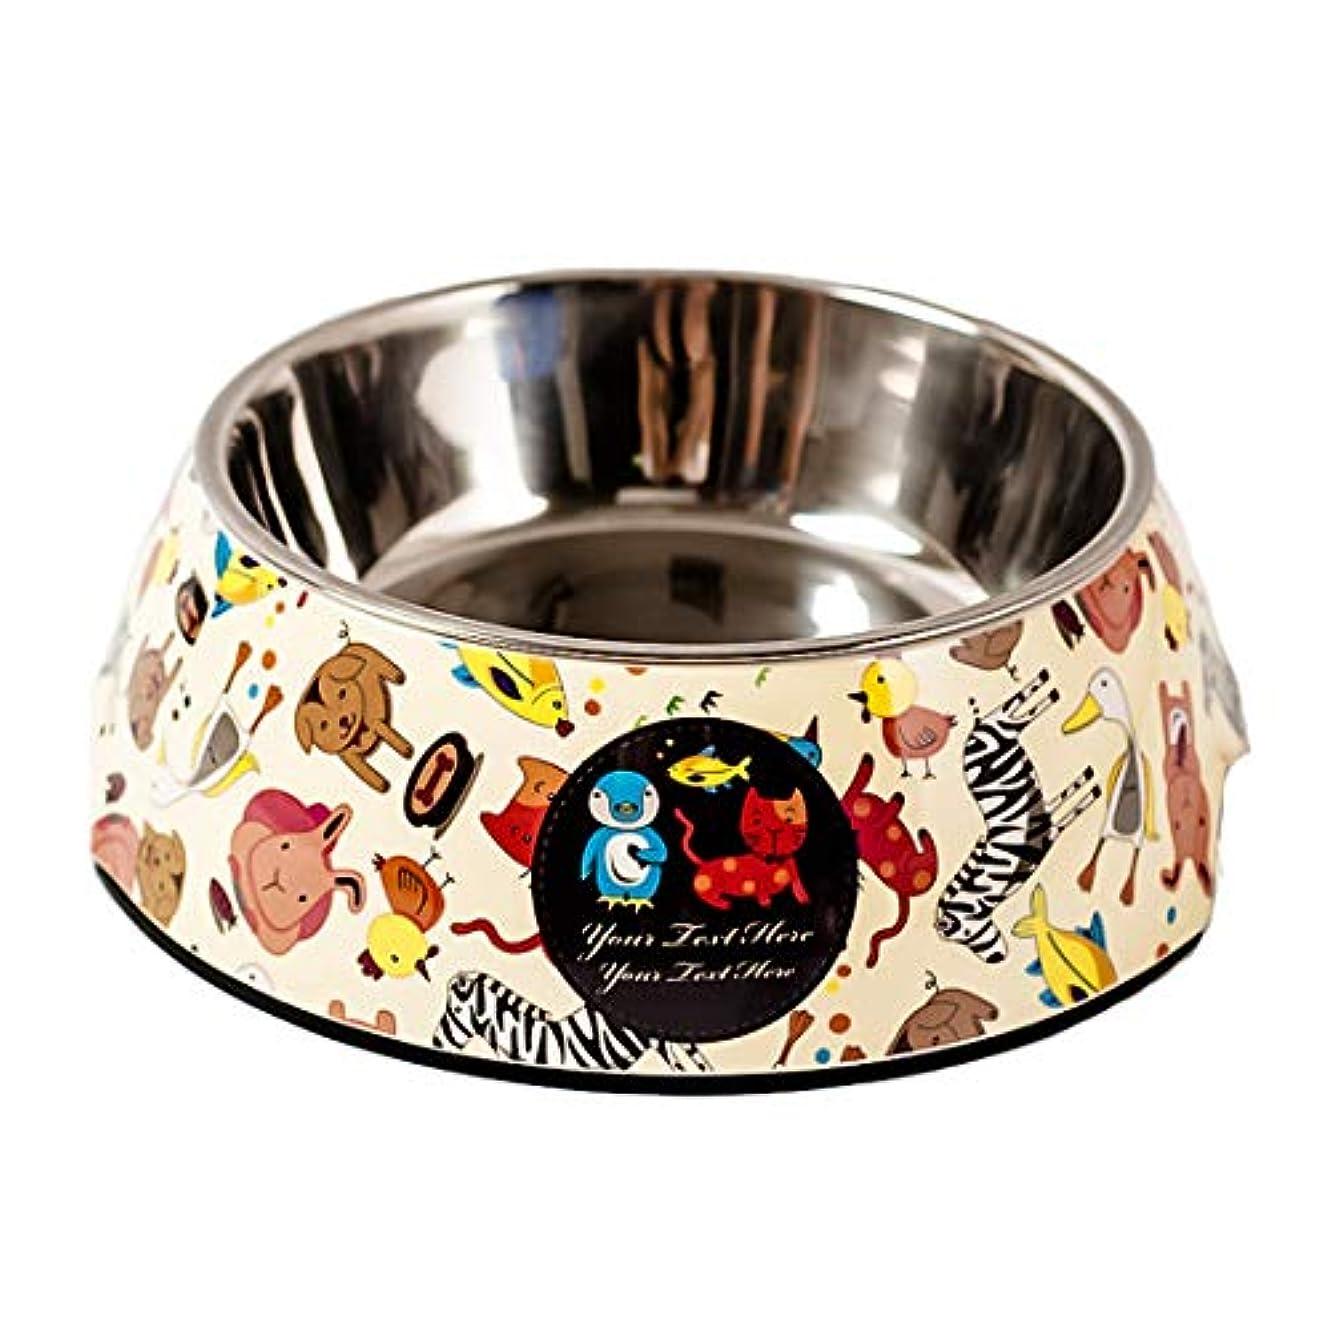 Jiyaru ペットボウル ペット食器 ボウル食器 小型 中型 犬用 猫用 ペット用 食器 小型 中型 犬 猫 餌皿 ウォーター フード ボウル ステンレス製 ご飯 水 お餌 入れ 食器 滑り止め付き